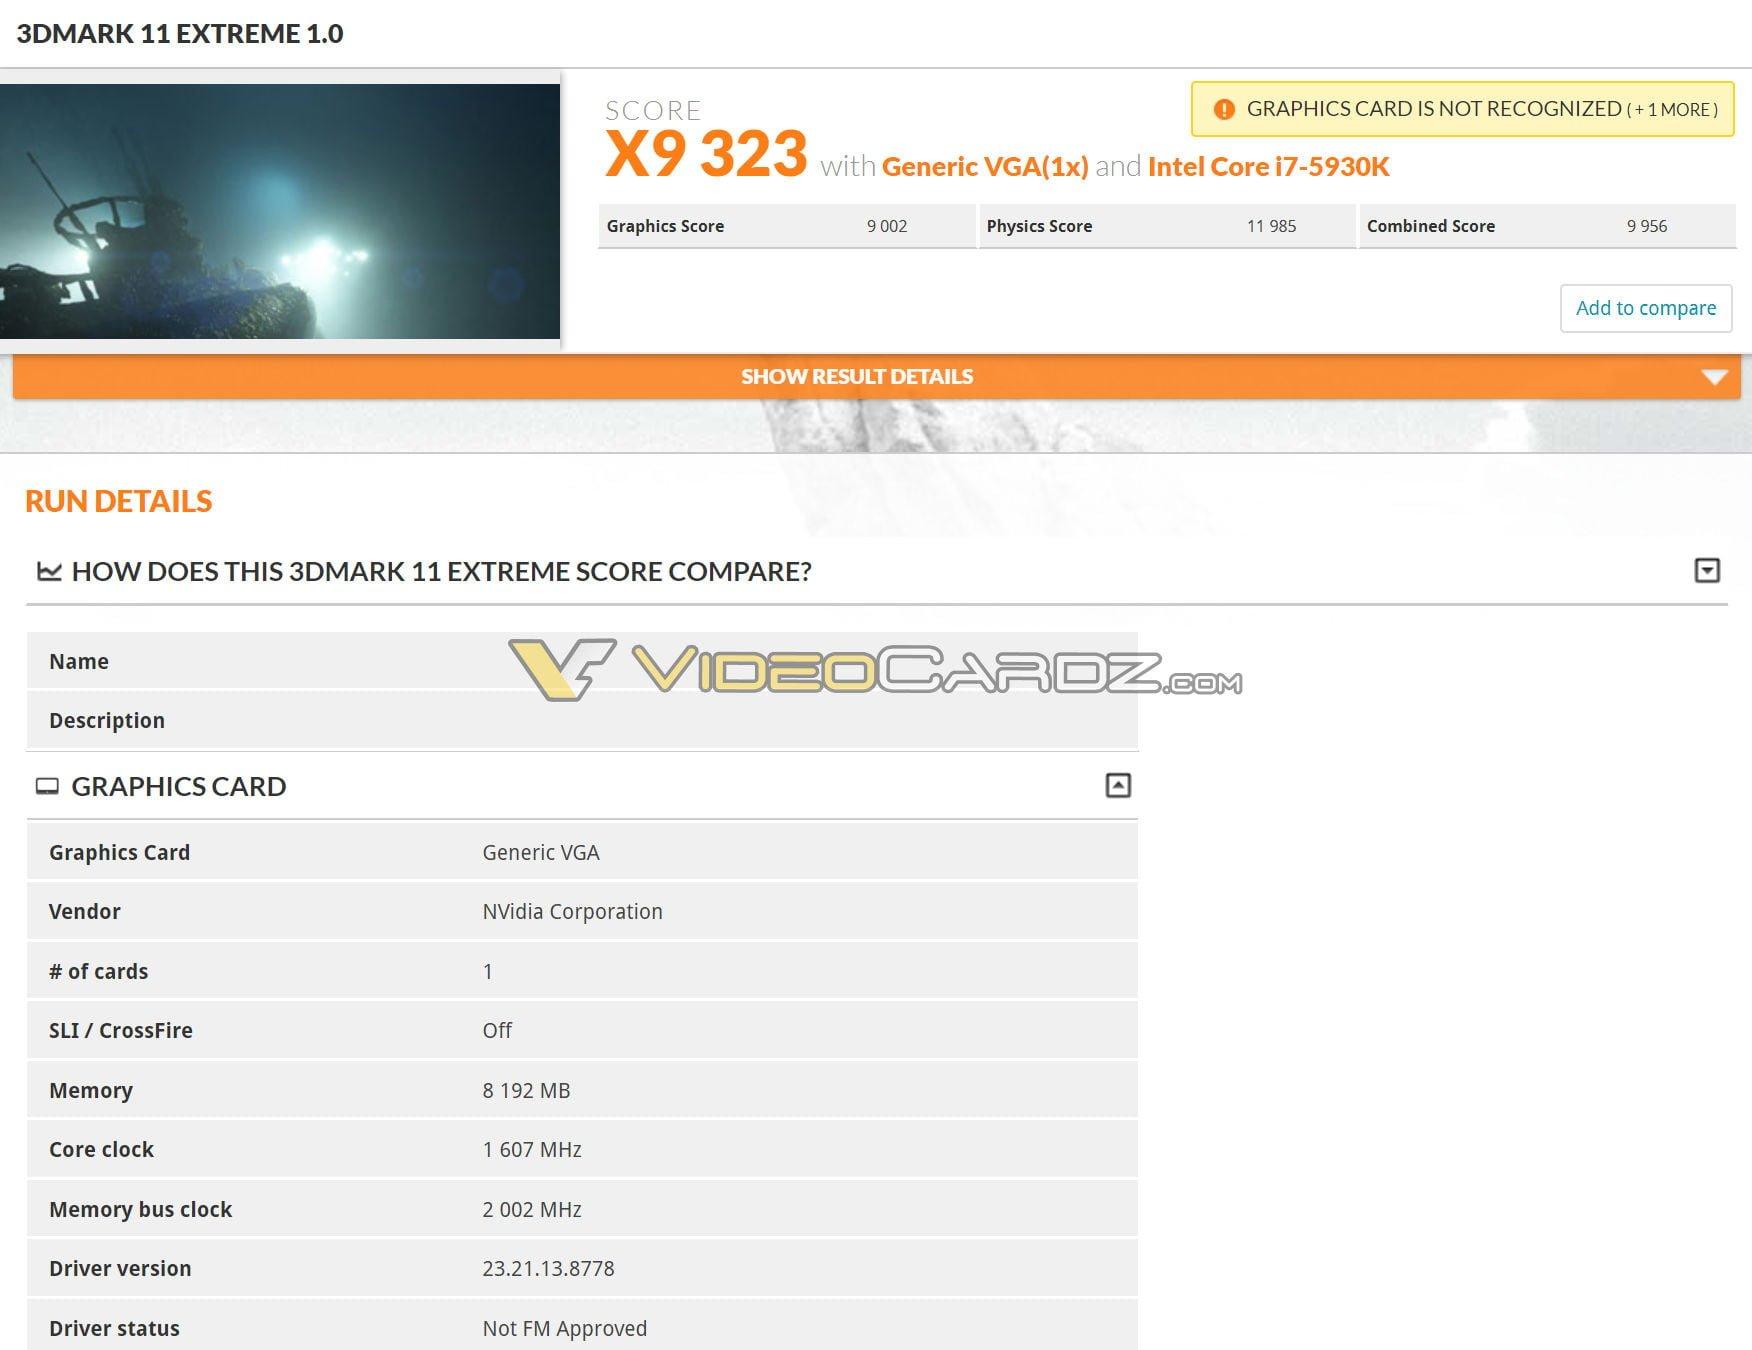 gtx 1070 3d mark extreme 1